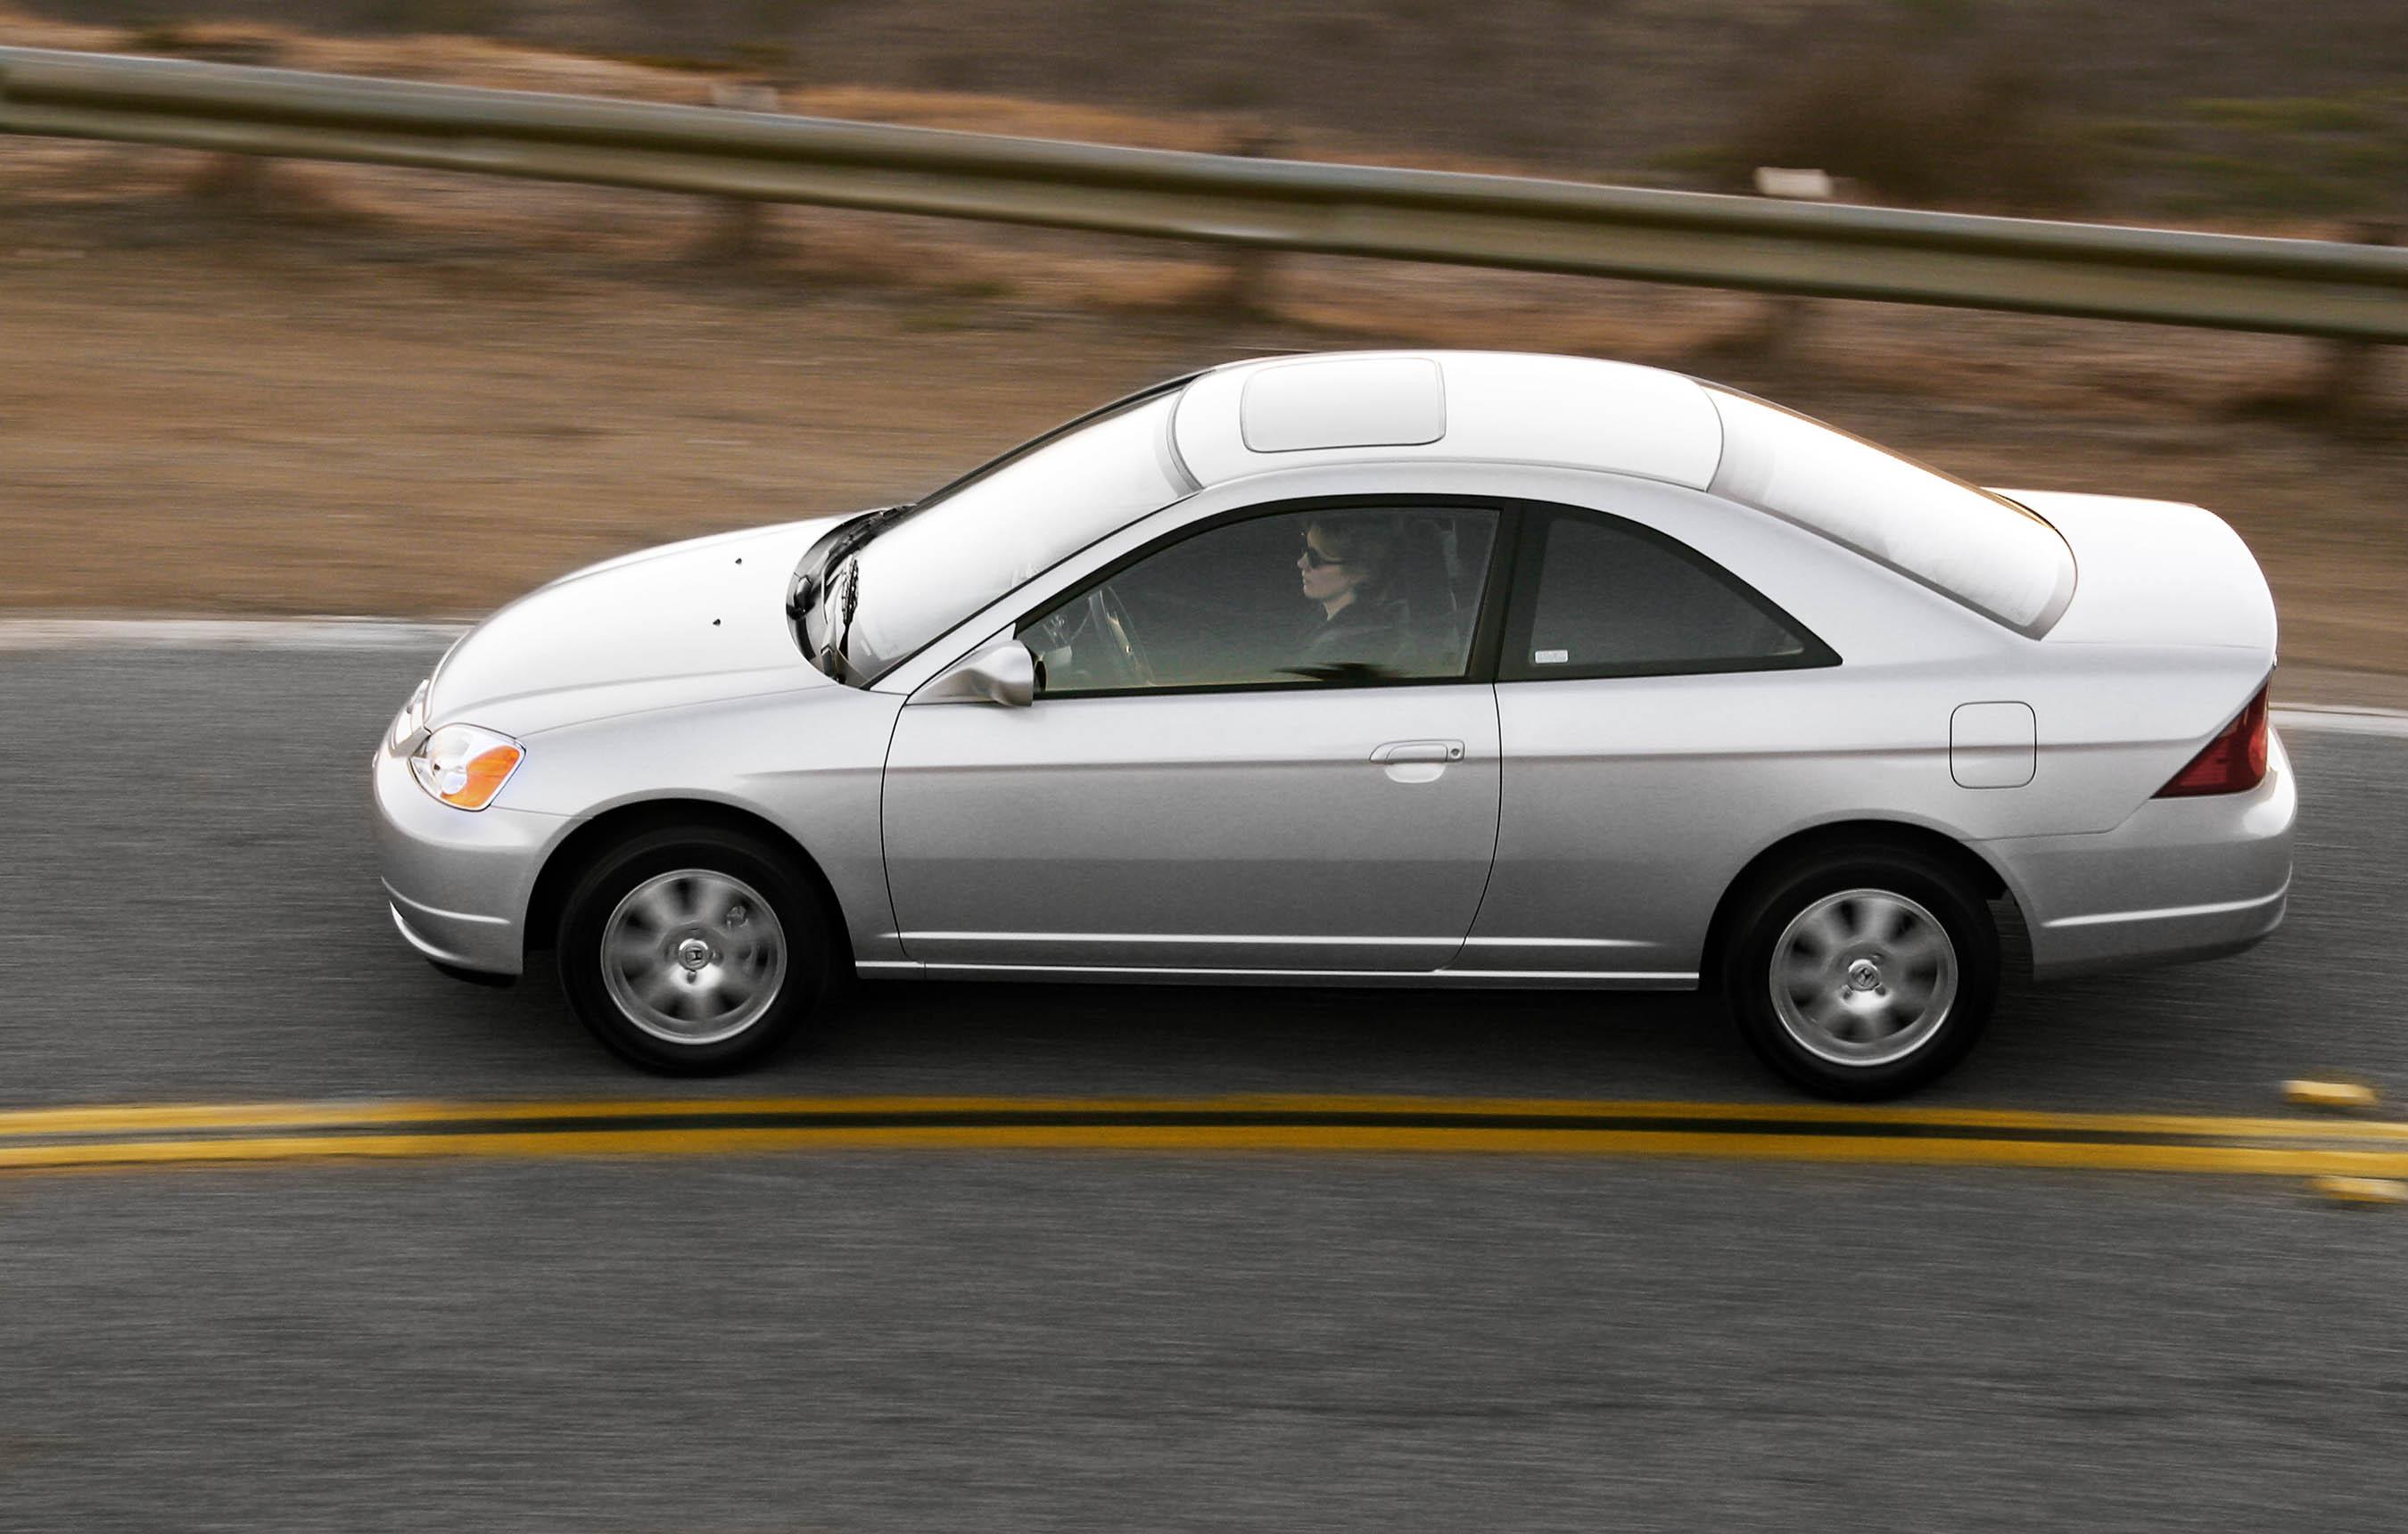 2003 Honda Civic Coupe Thumbnail Photo 73302